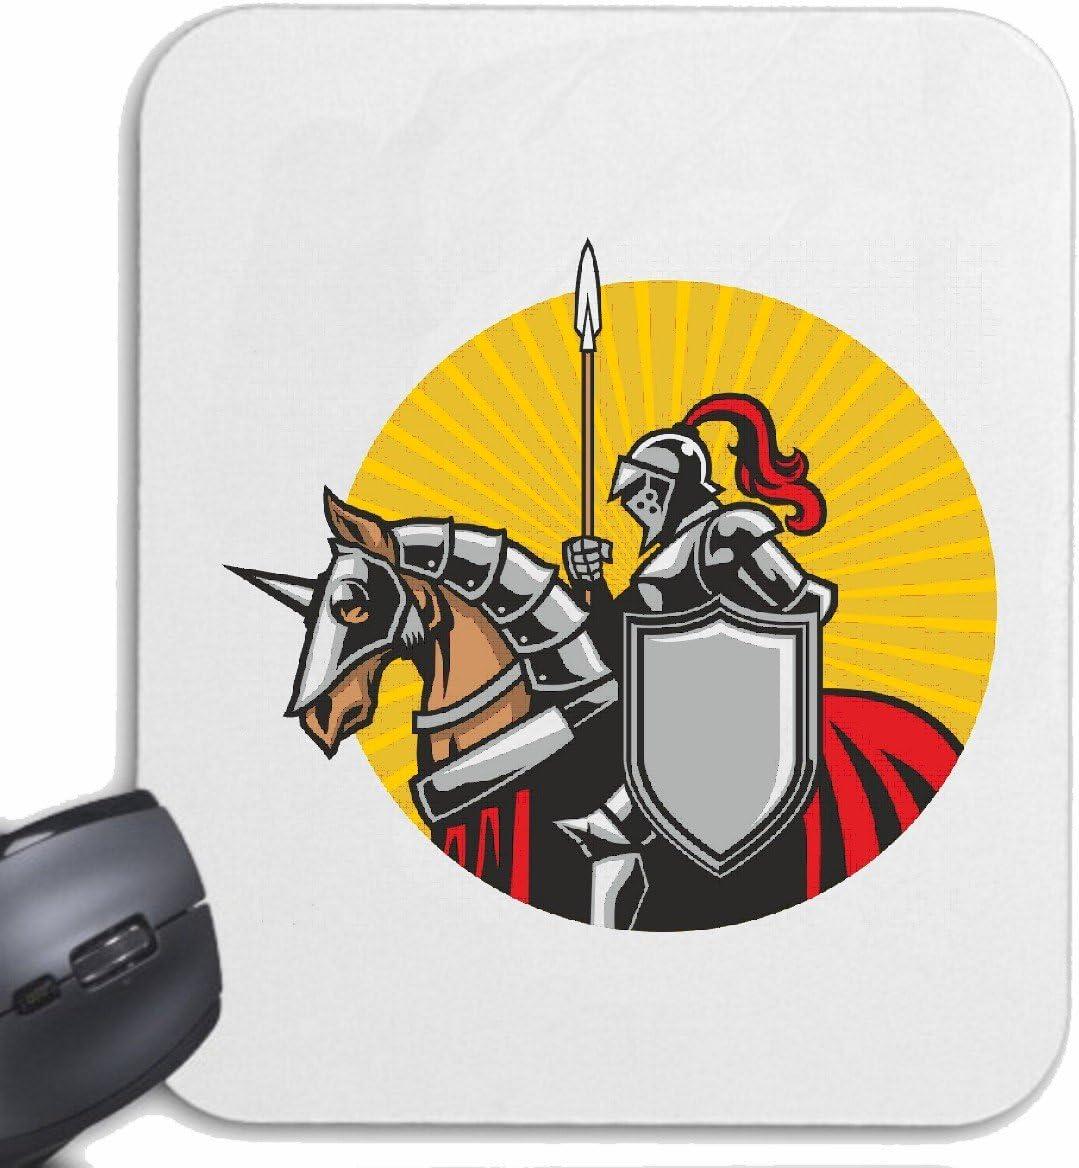 Mousepad alfombrilla de ratón Logotipo del caballero CON EL CABALLO KNIGHTSWORD KNIGHT KNIGHT ARMOUR Ritterburg CASCO PROTECTOR para su portátil, ordenador portátil o PC de Internet (con Windows Linu